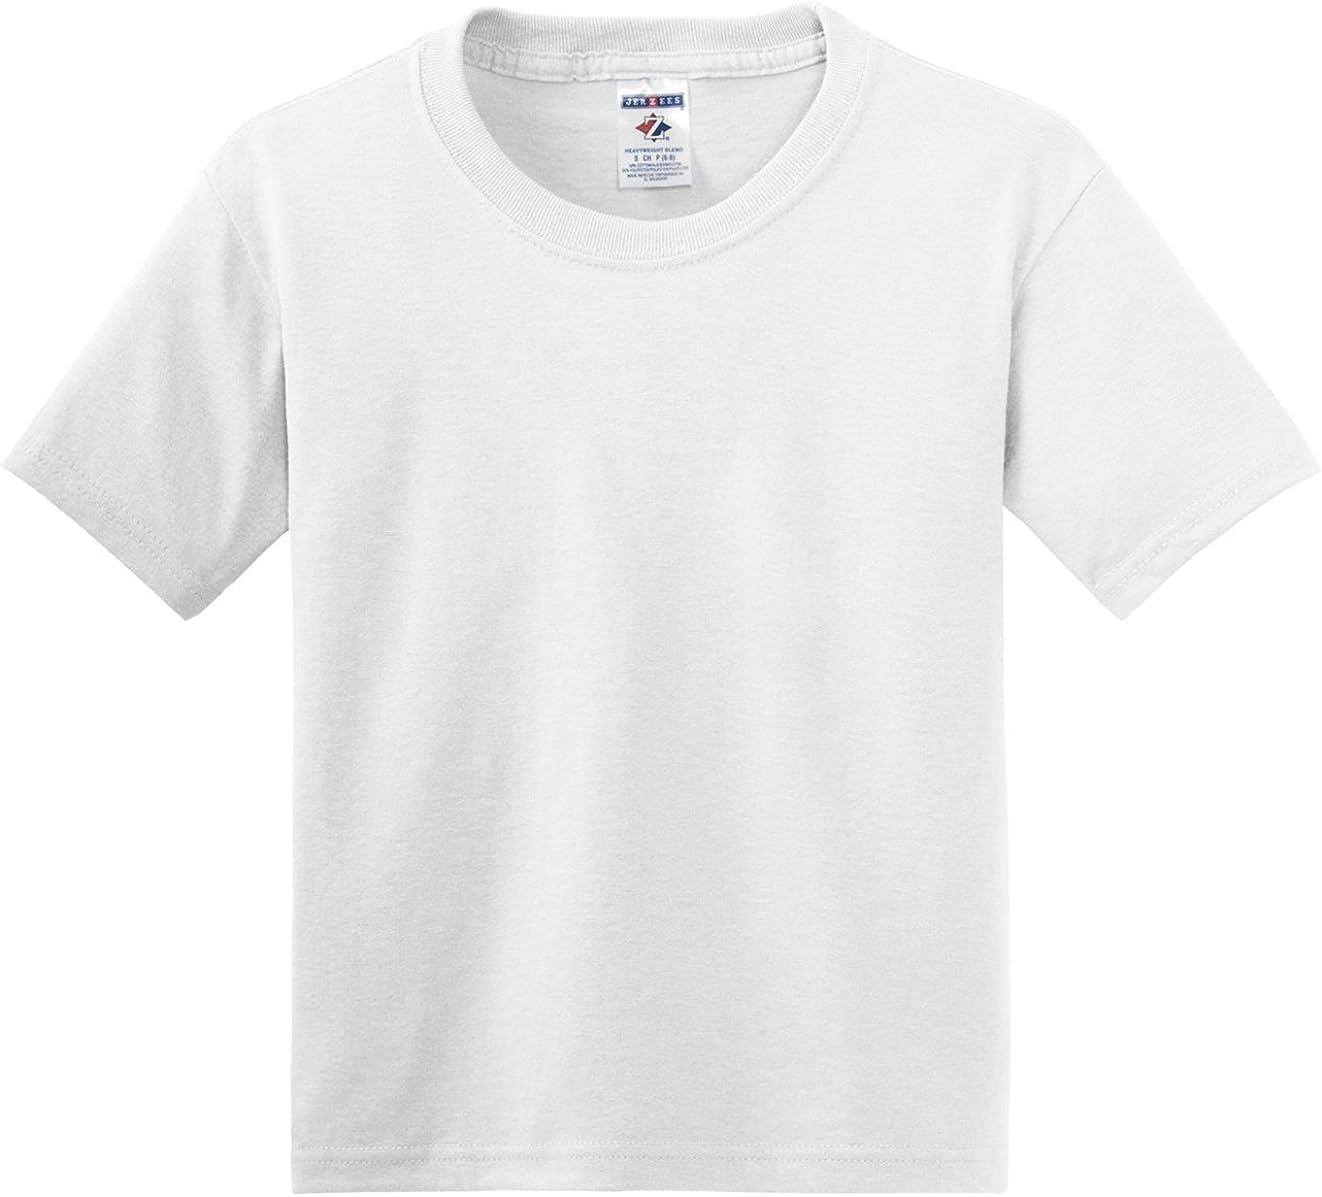 Jerzees Heavyweight Crewneck T-Shirt, White, XSmall. (Pack of 6)